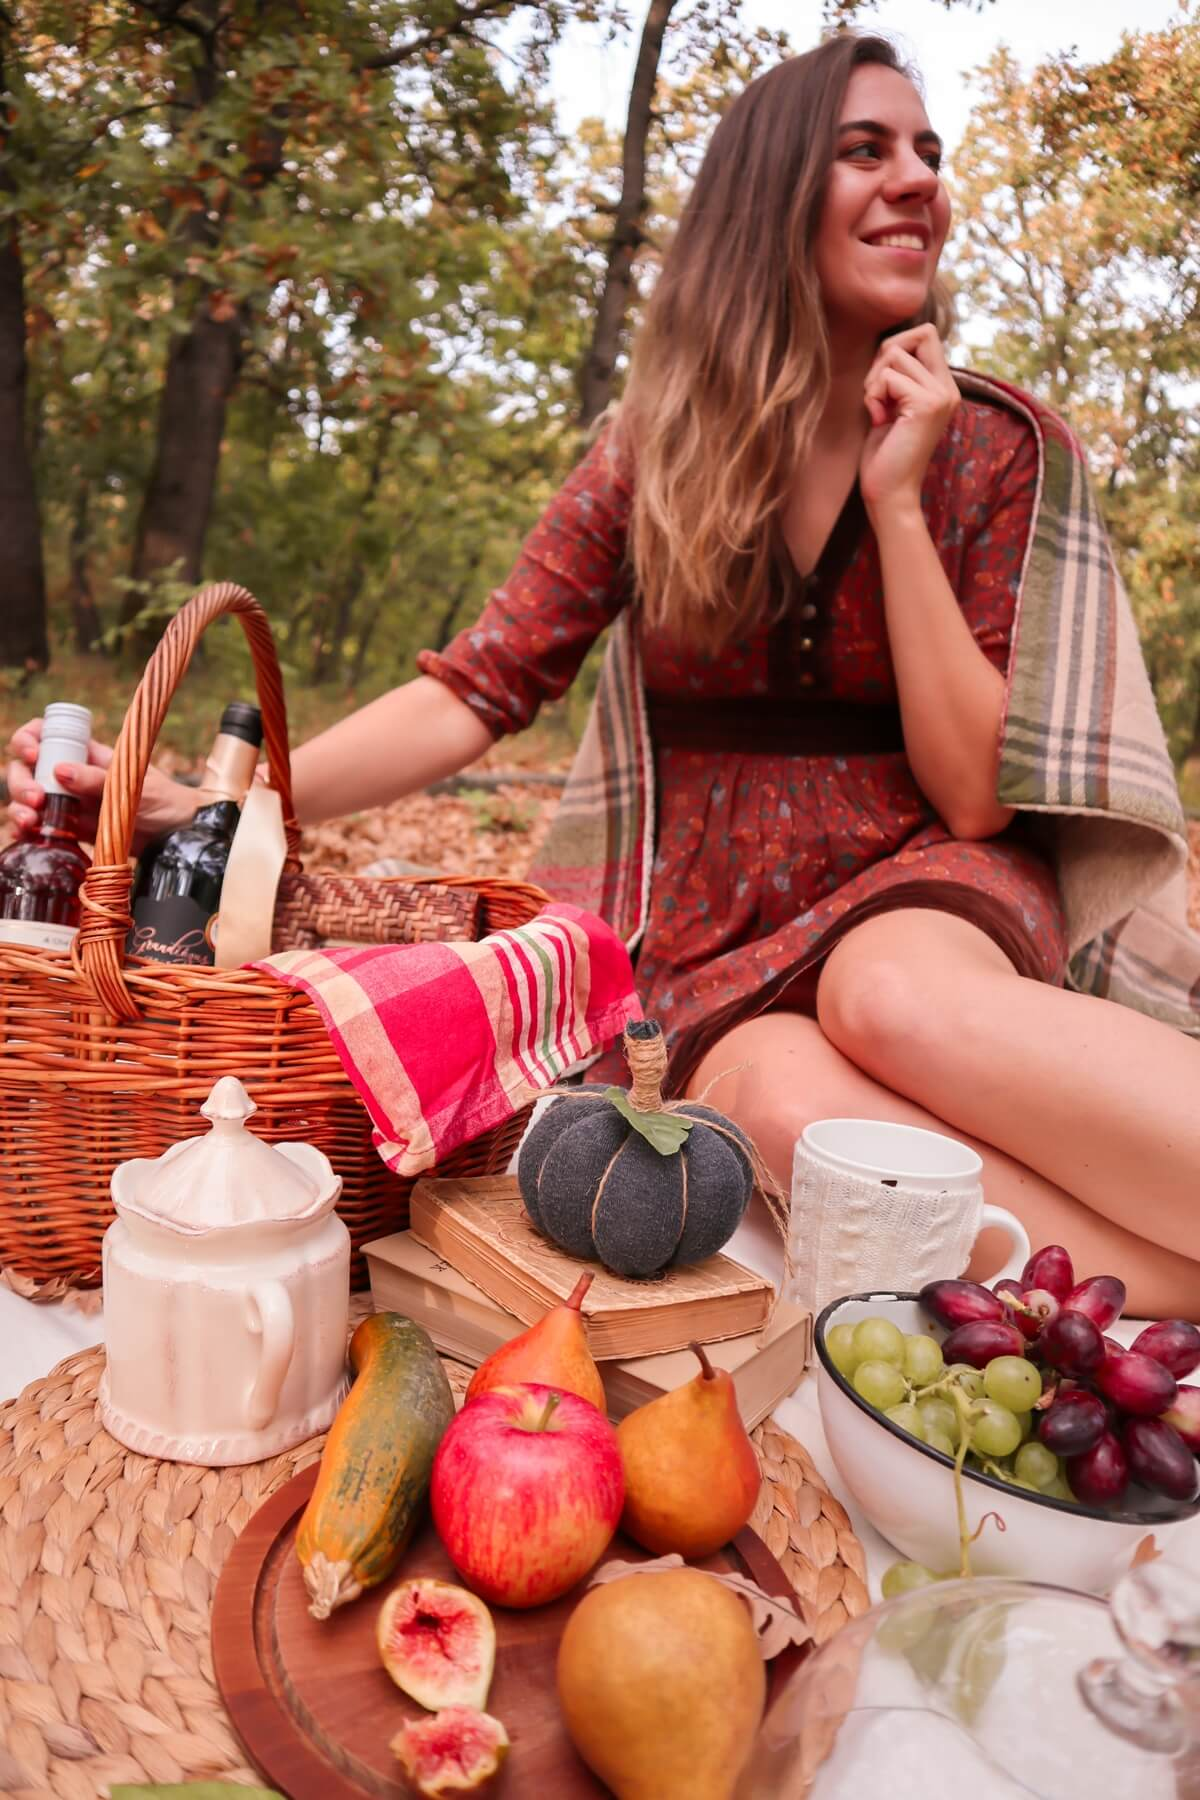 oszi-piknik-kellekei-bakancslista